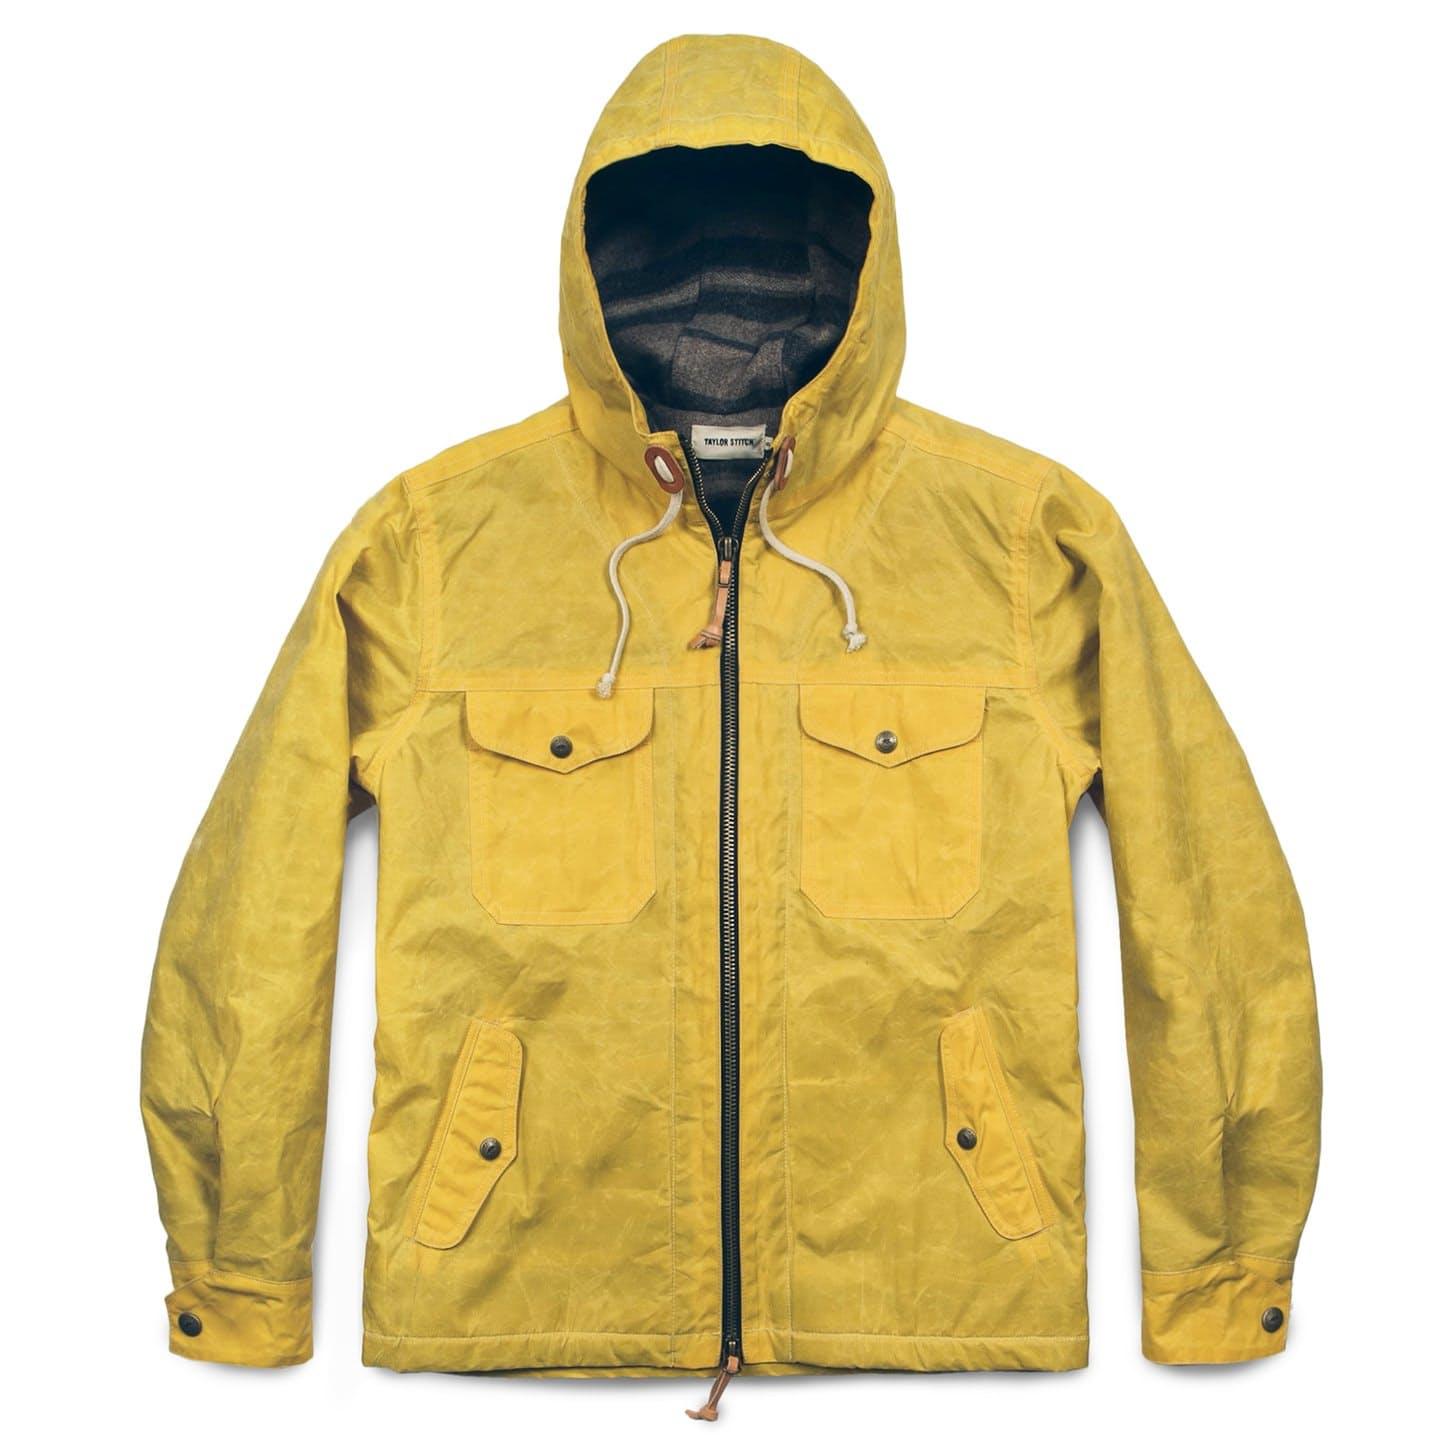 Hmzggfvhzq taylor stitch the winslow jacket 0 original